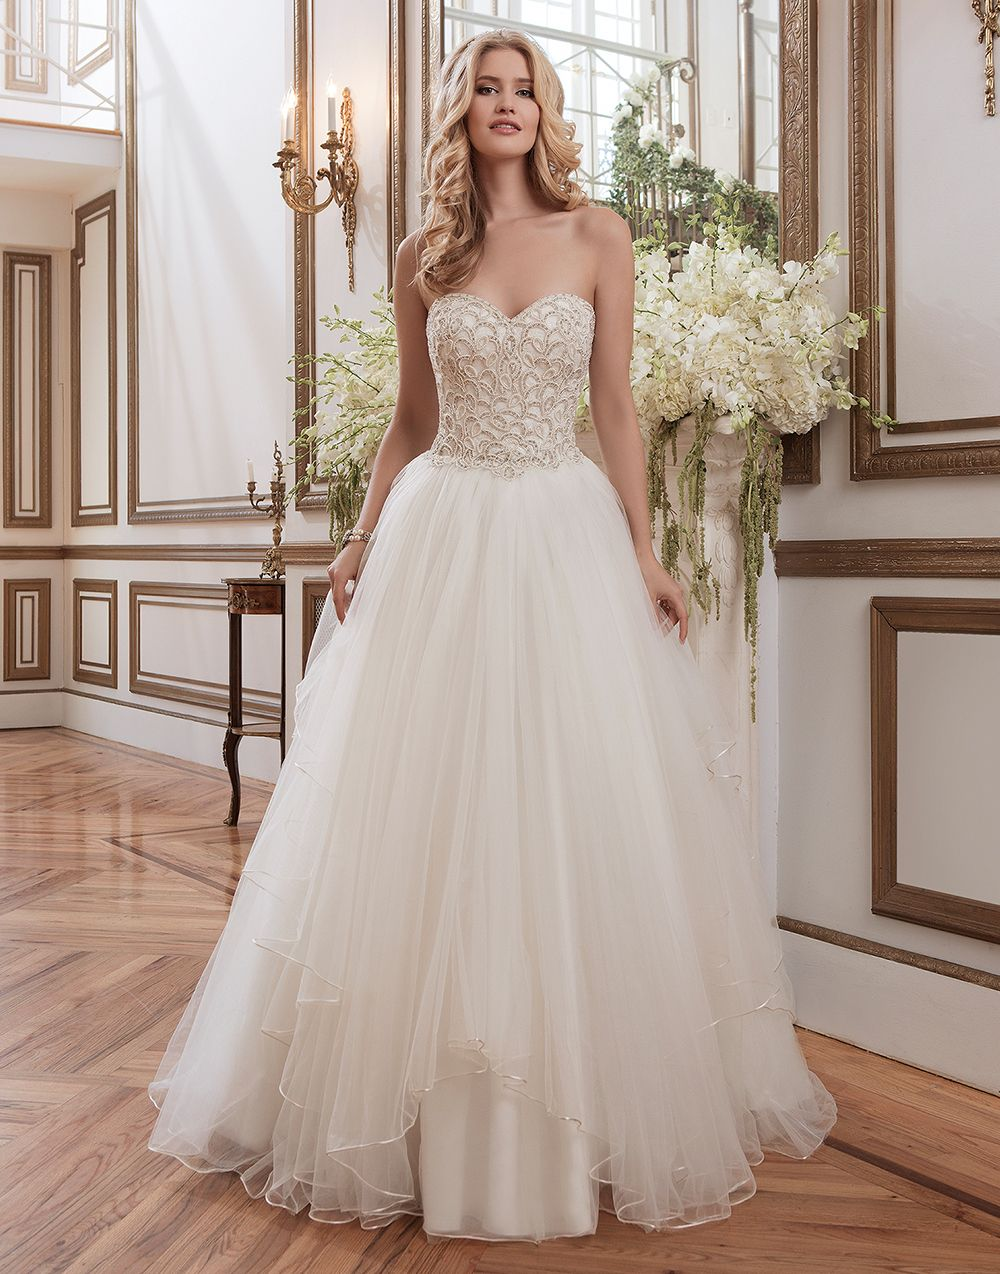 Justin Alexander wedding dresses style 8786 | Tulle balls, Ball ...